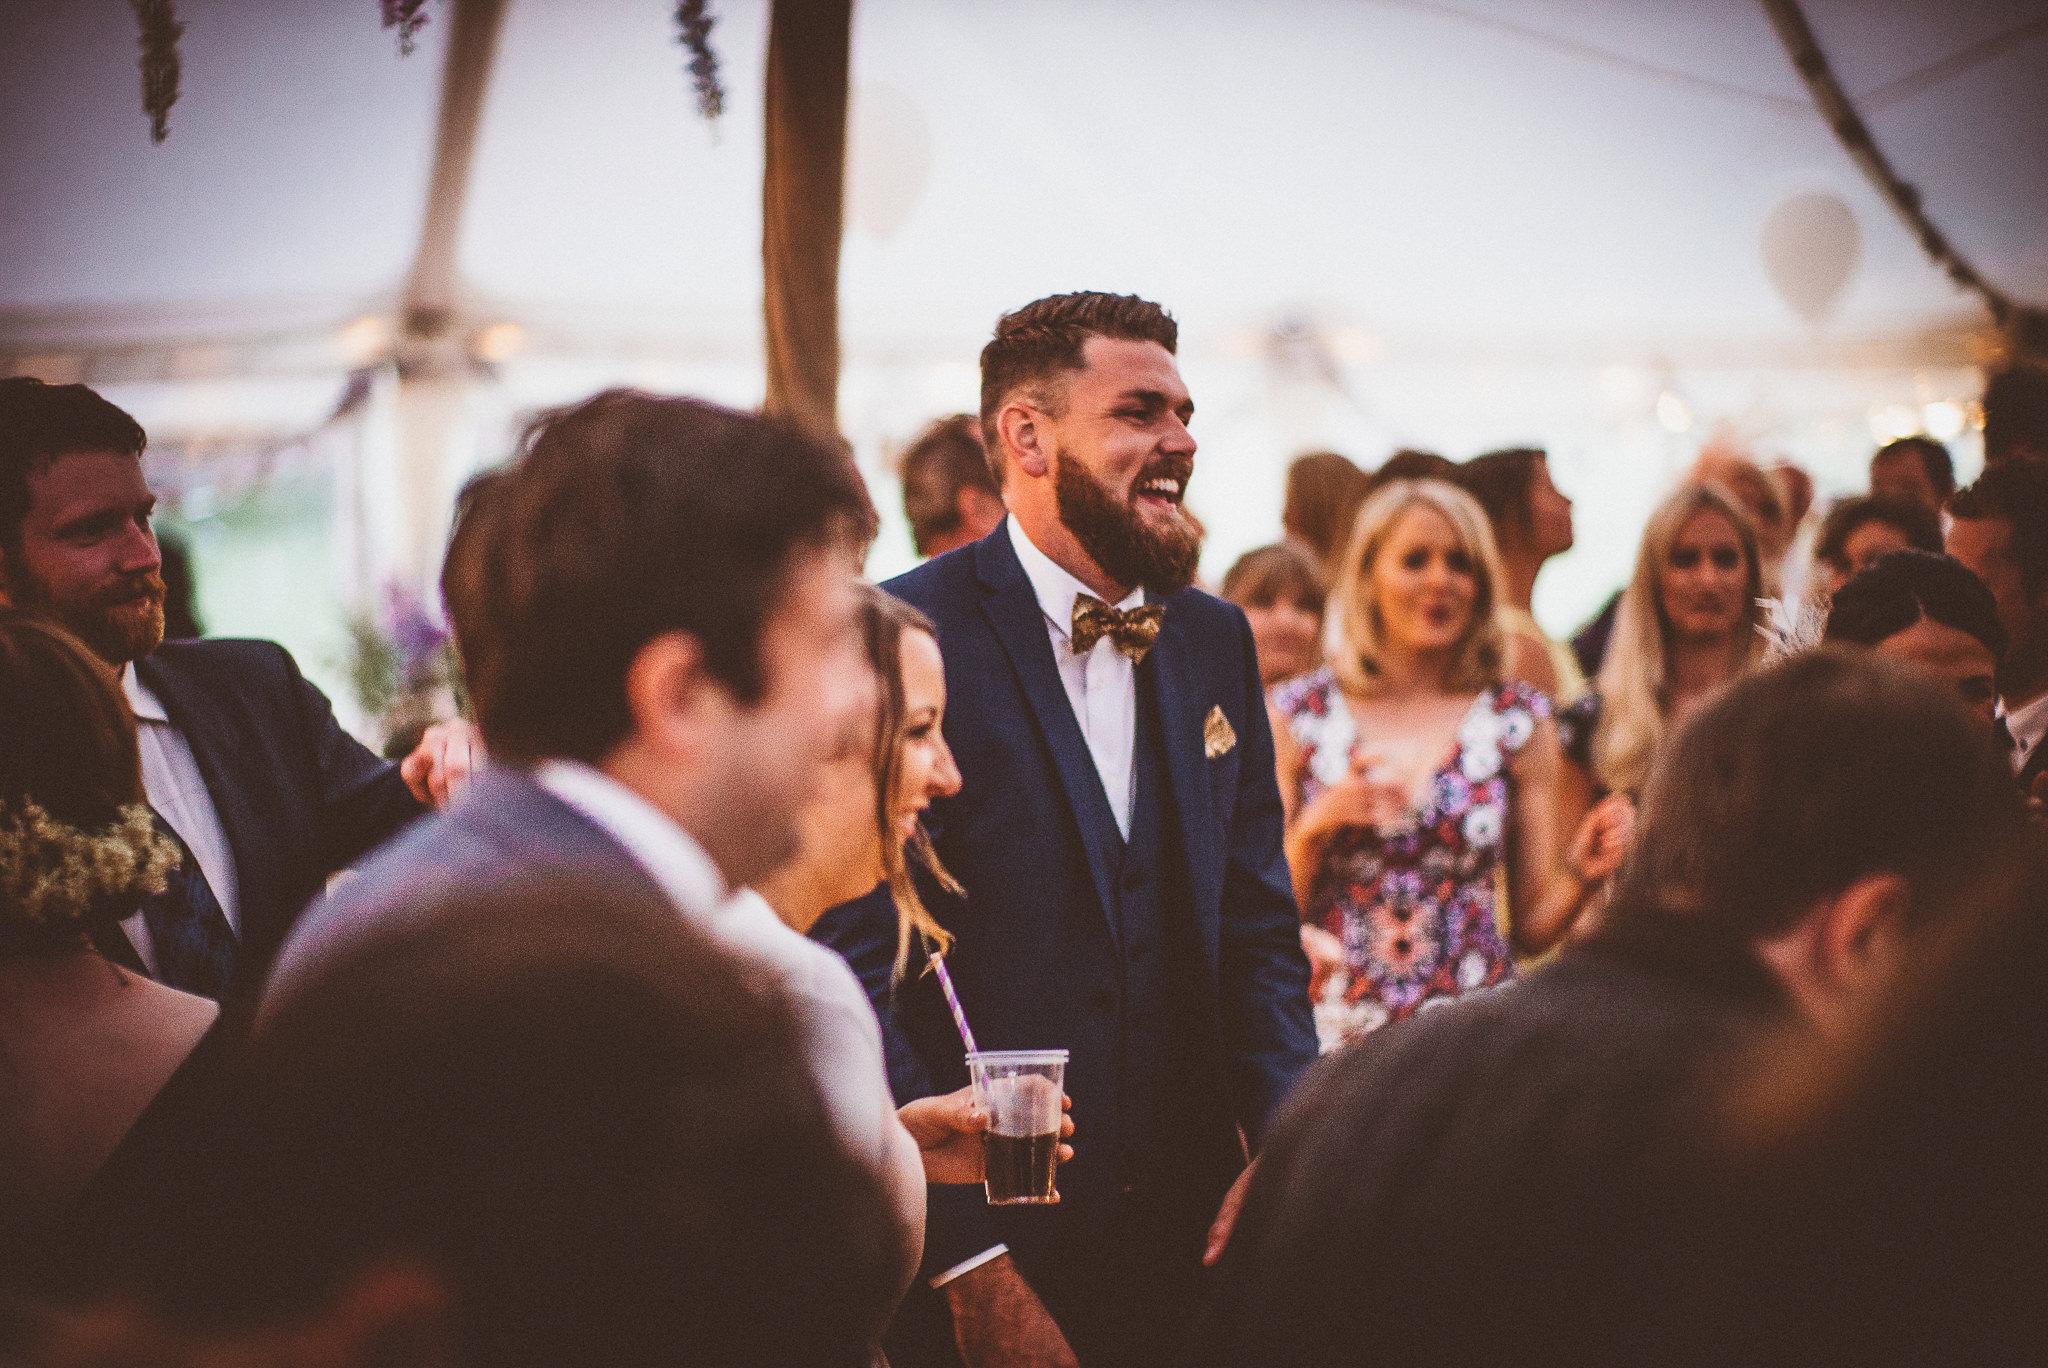 paul-marbrook-Farm-Wedding-Photographer-Lancashire-90109